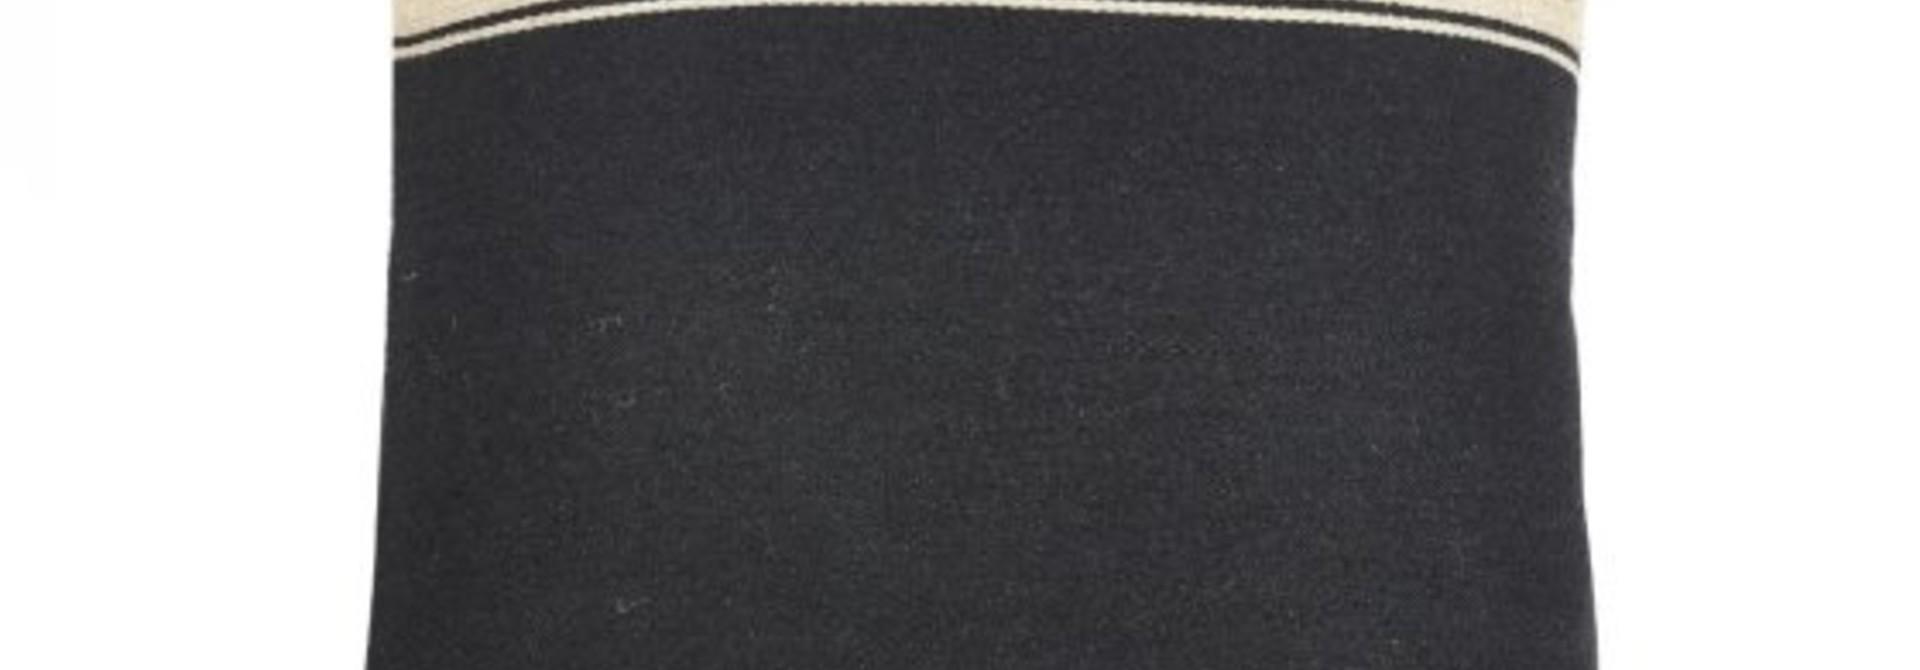 Cushion - Marshall - Black Flax